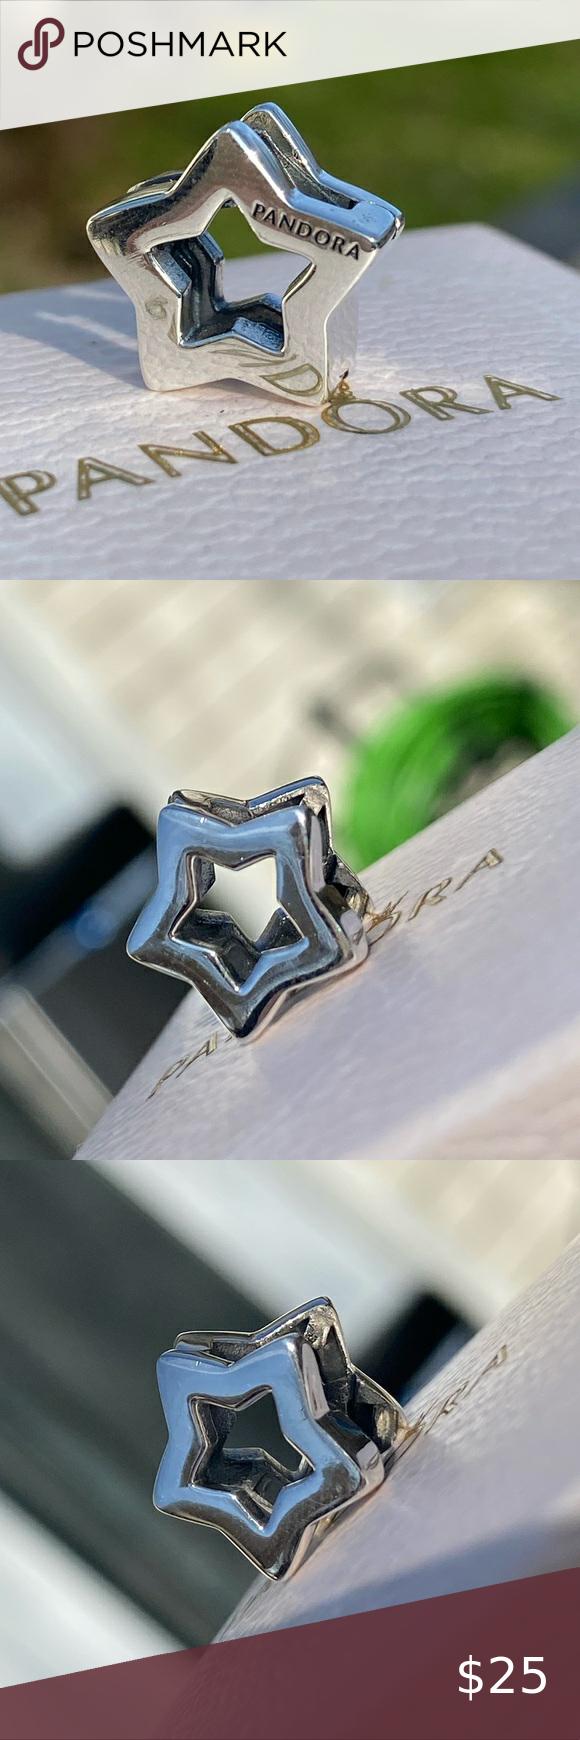 Pandora Reflexions Sleek Star Clip Charm Authentic Pandora ...